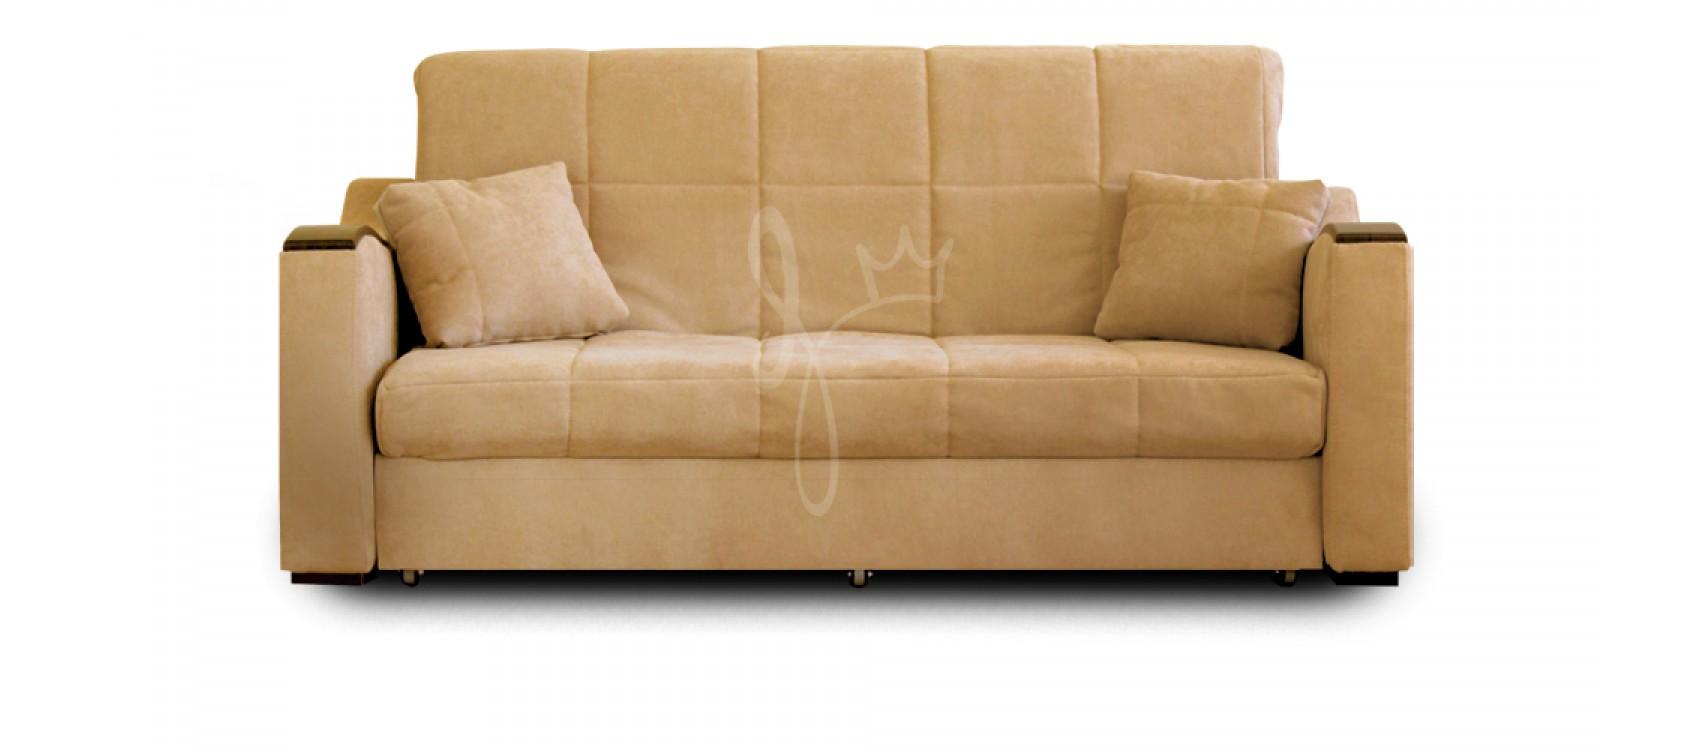 Sofa HAVANA foto 1